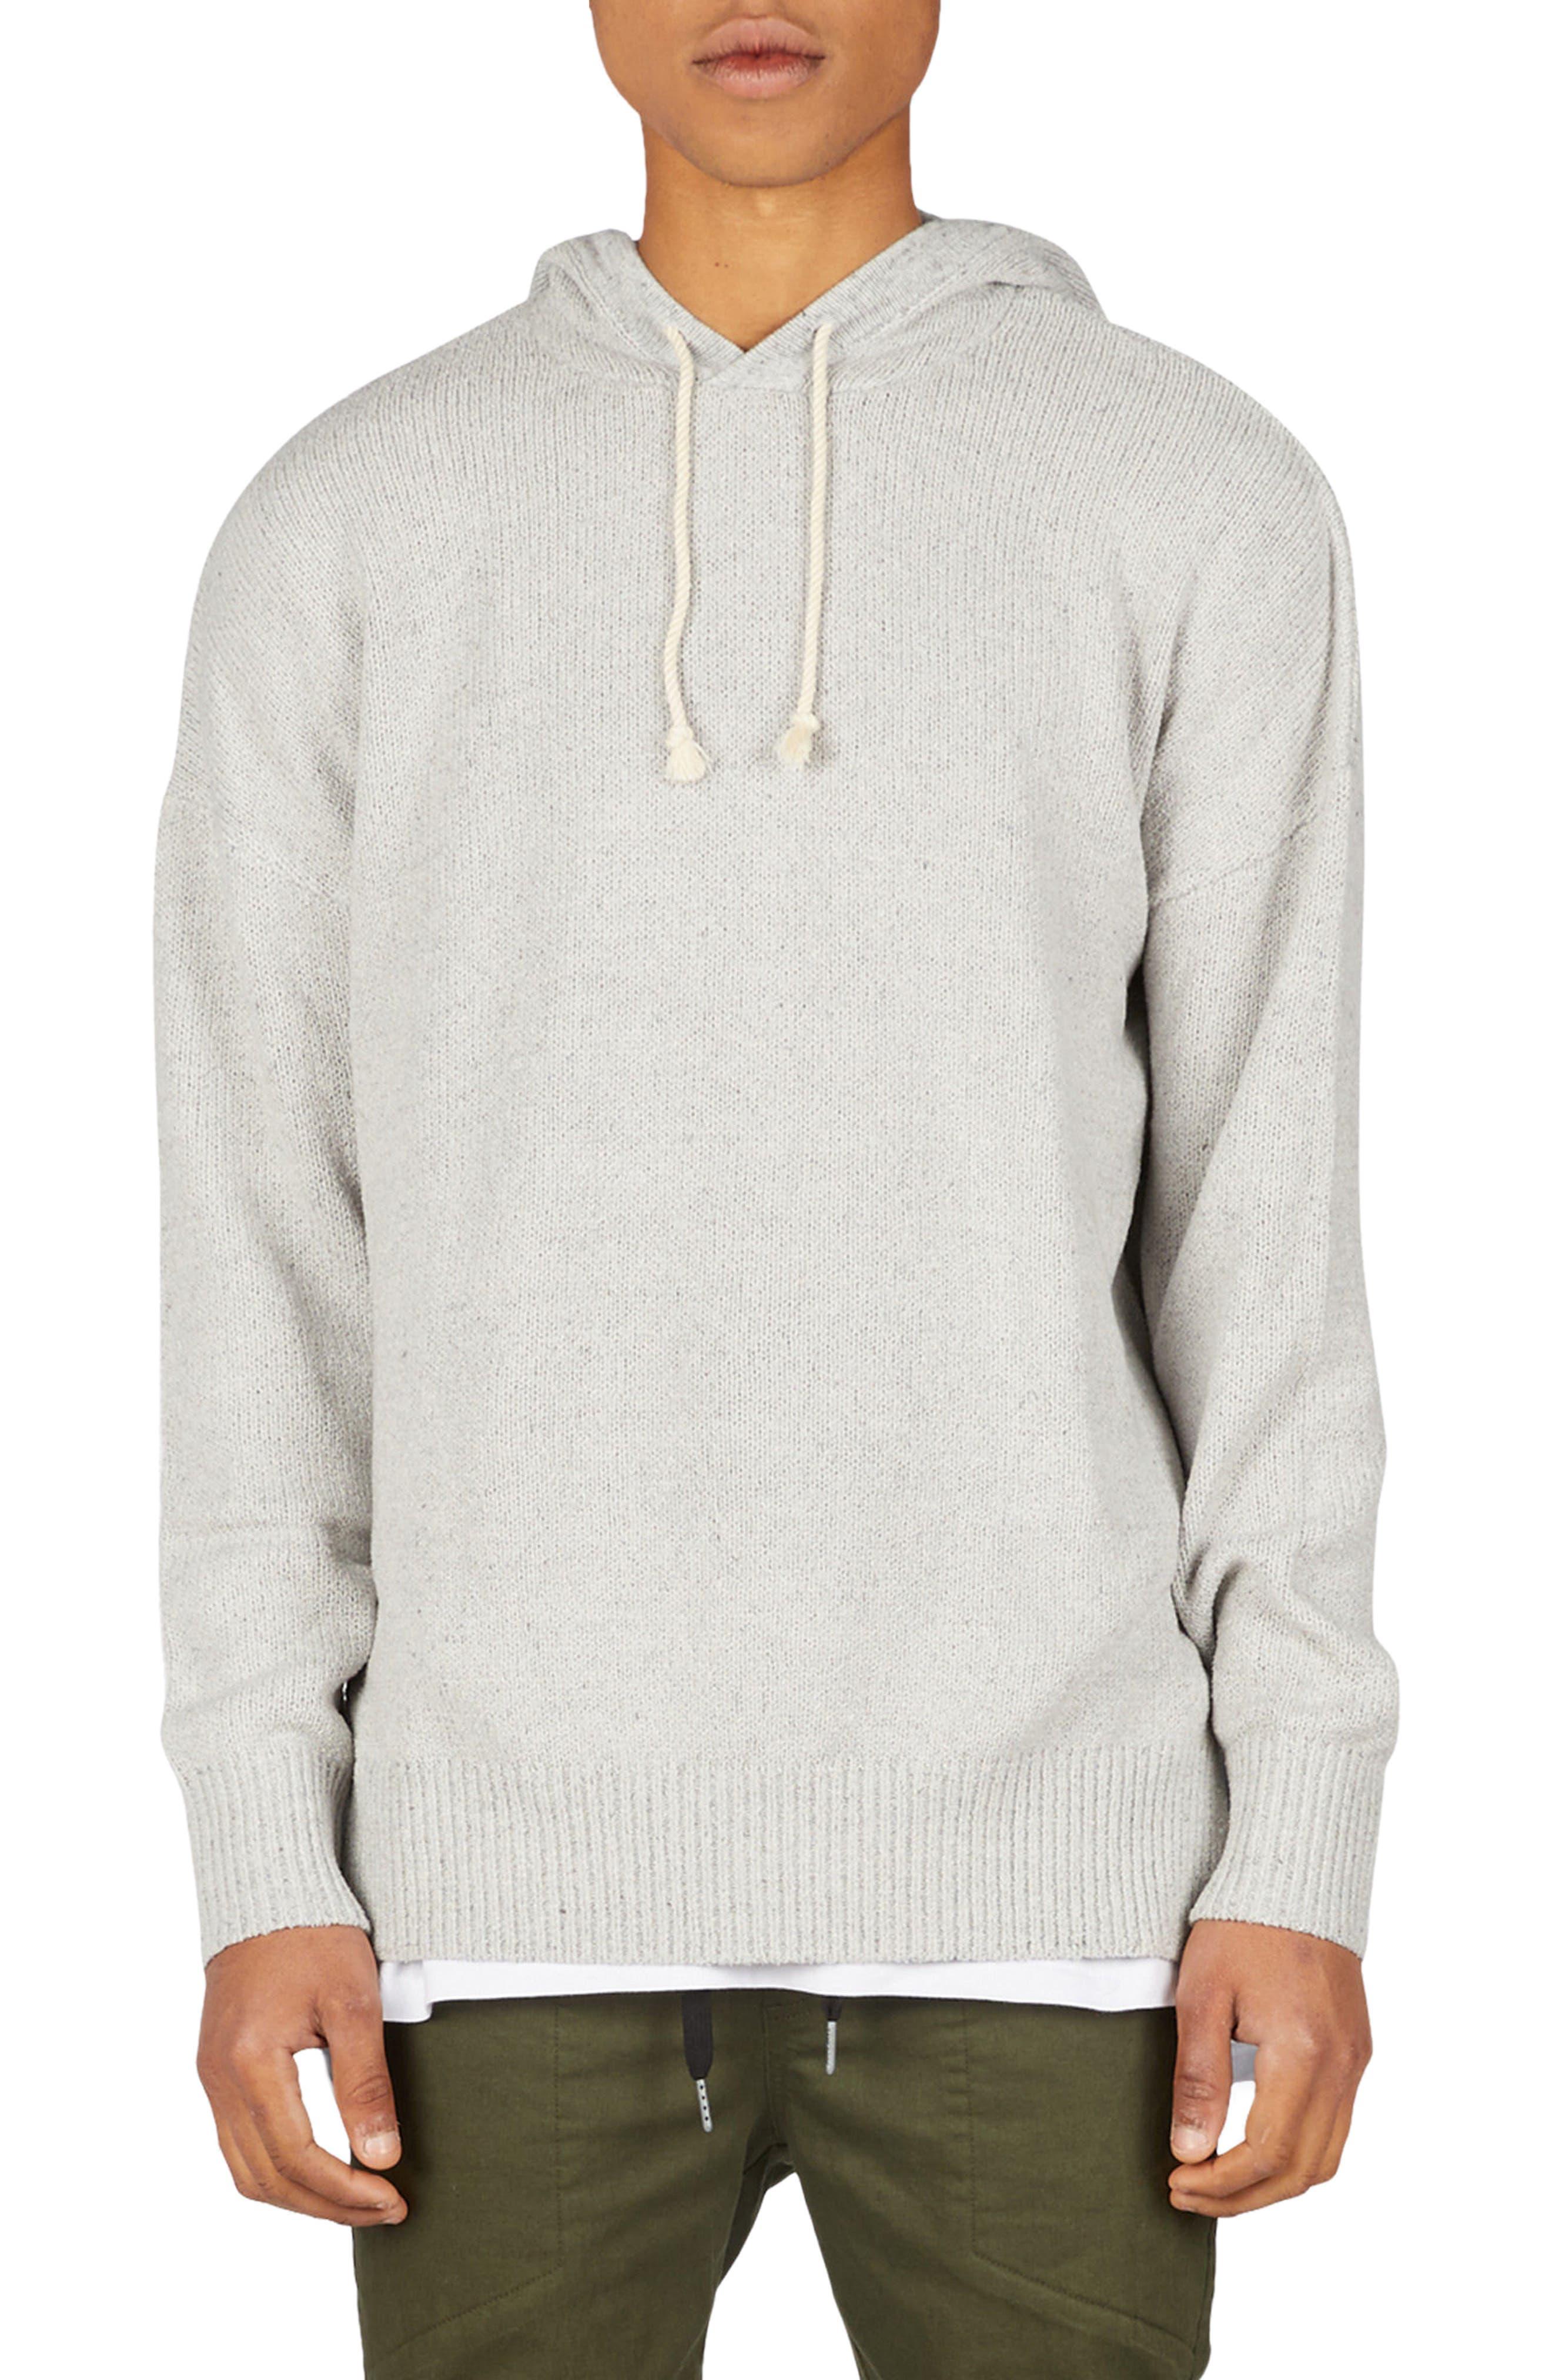 Towel Knit Hooded Sweatshirt,                             Main thumbnail 1, color,                             Grey